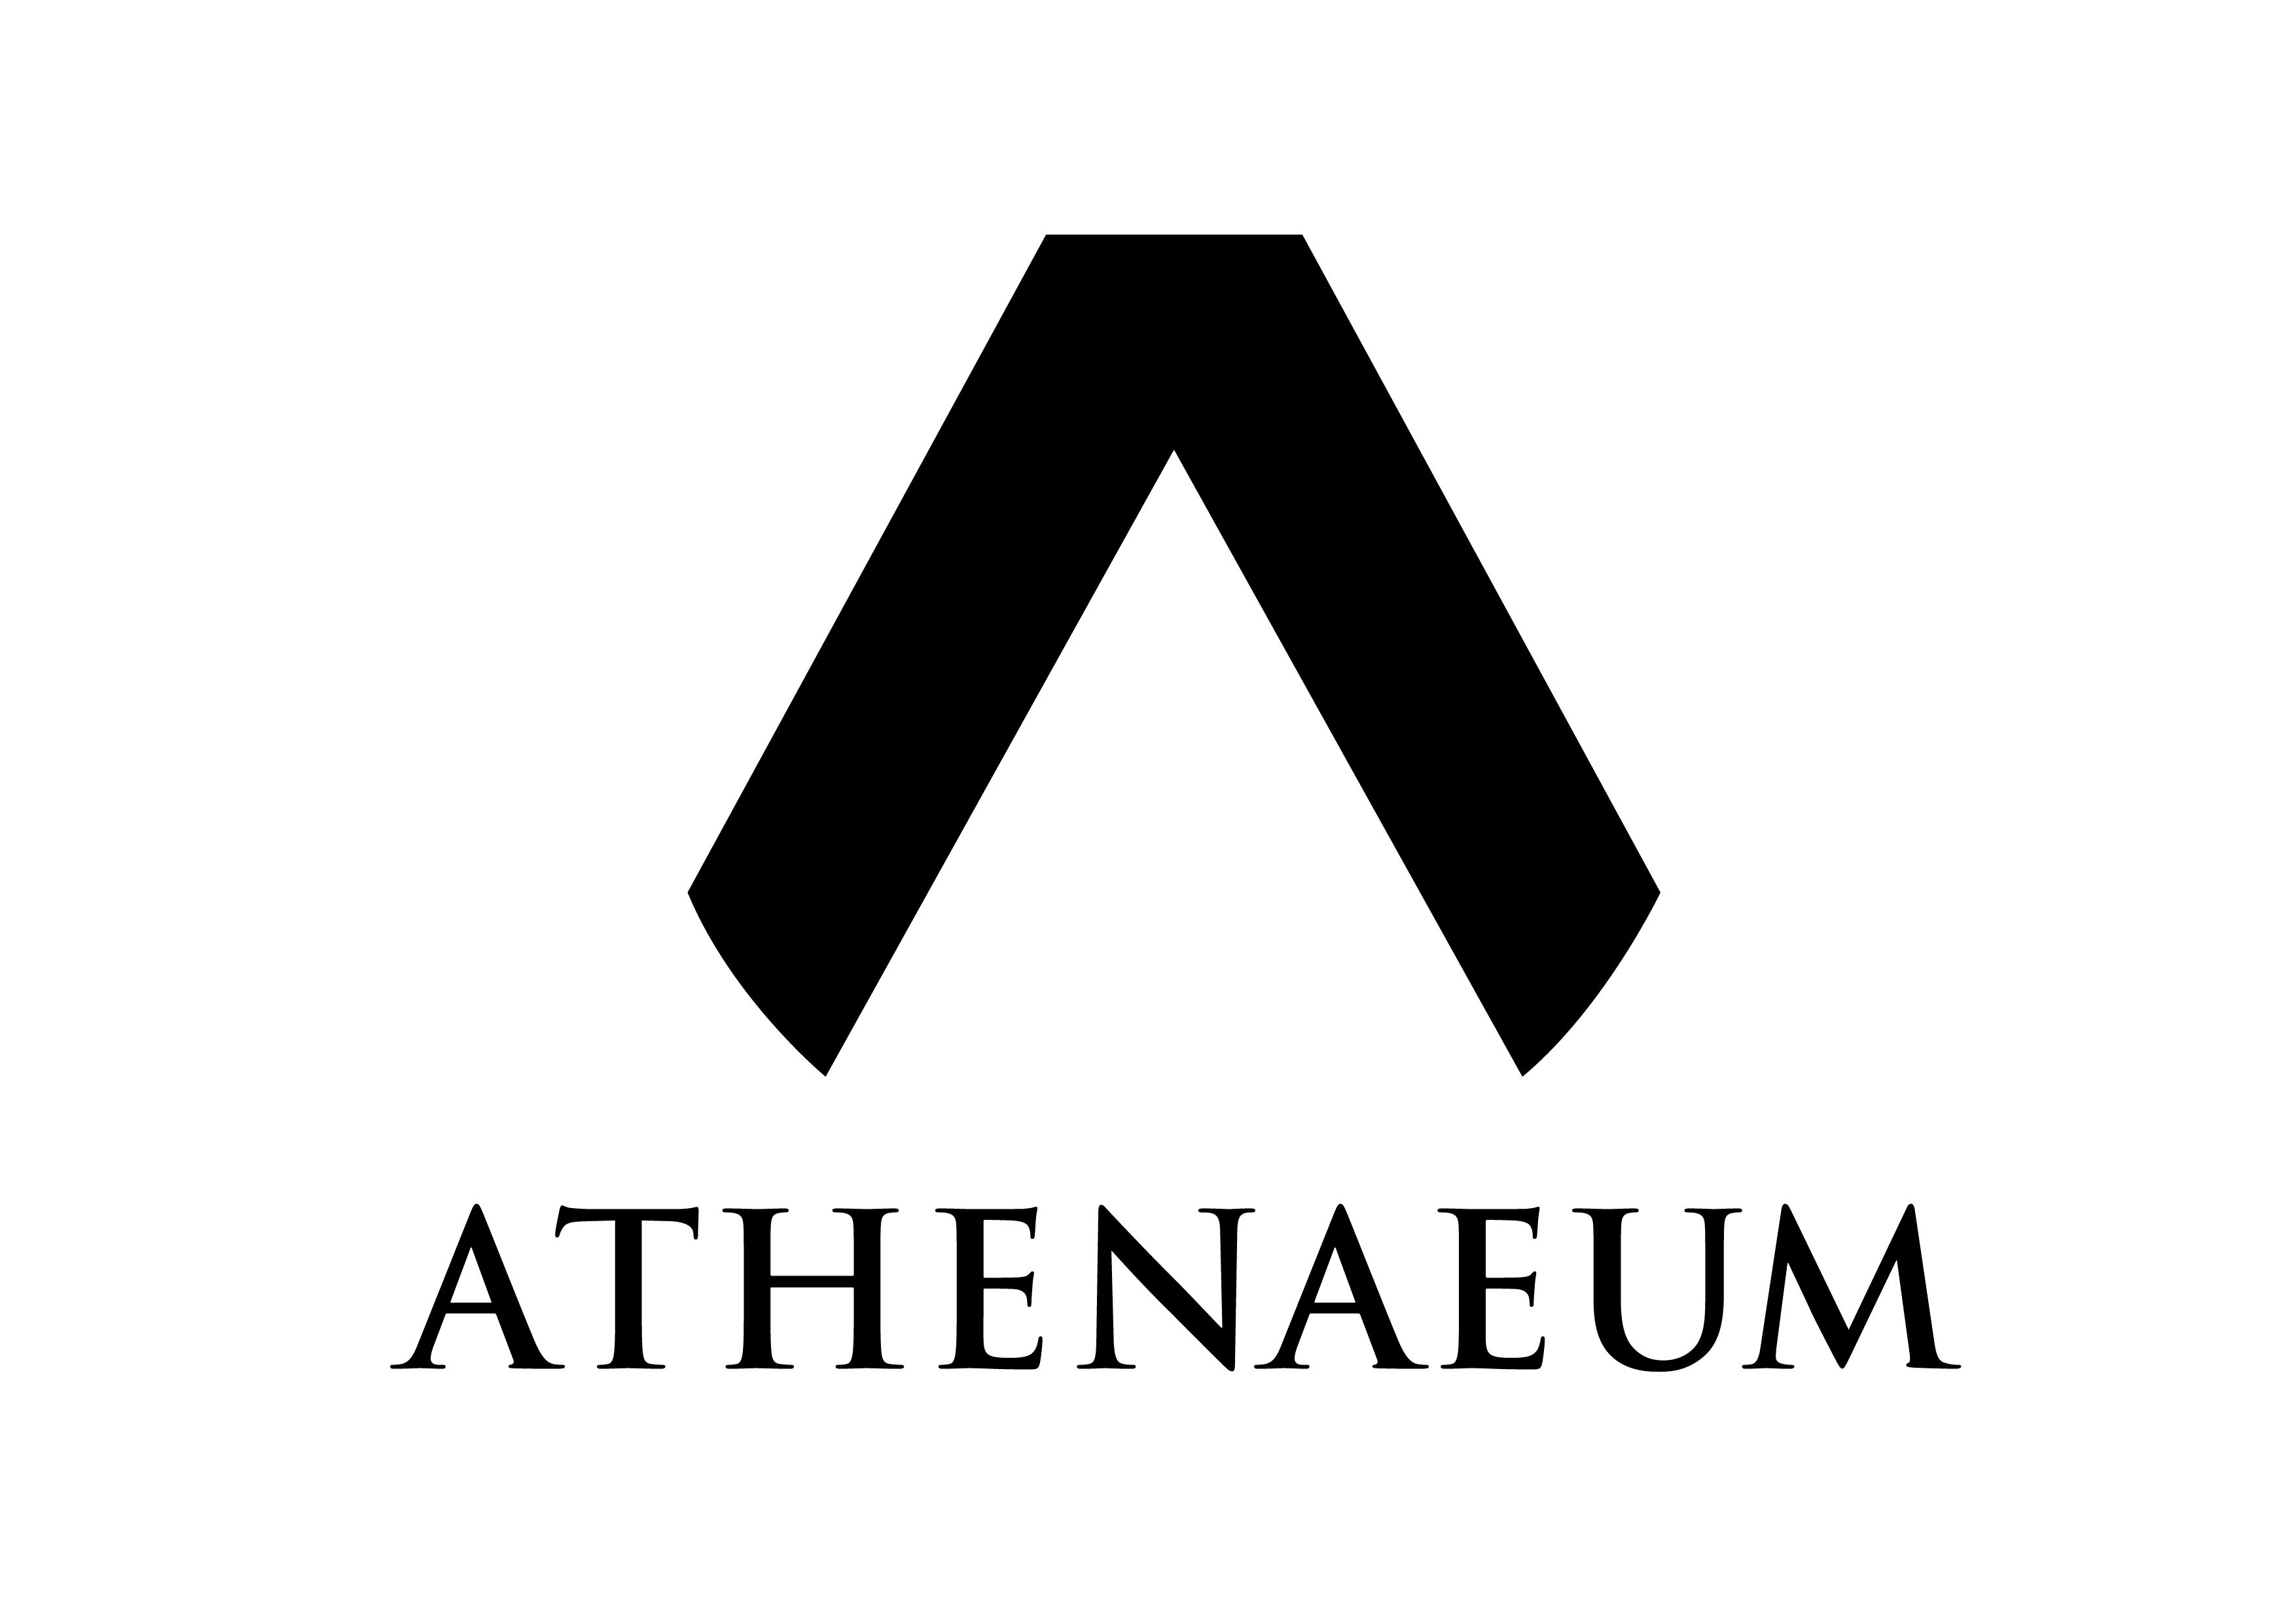 athenaeum_new_nevvel_fekete